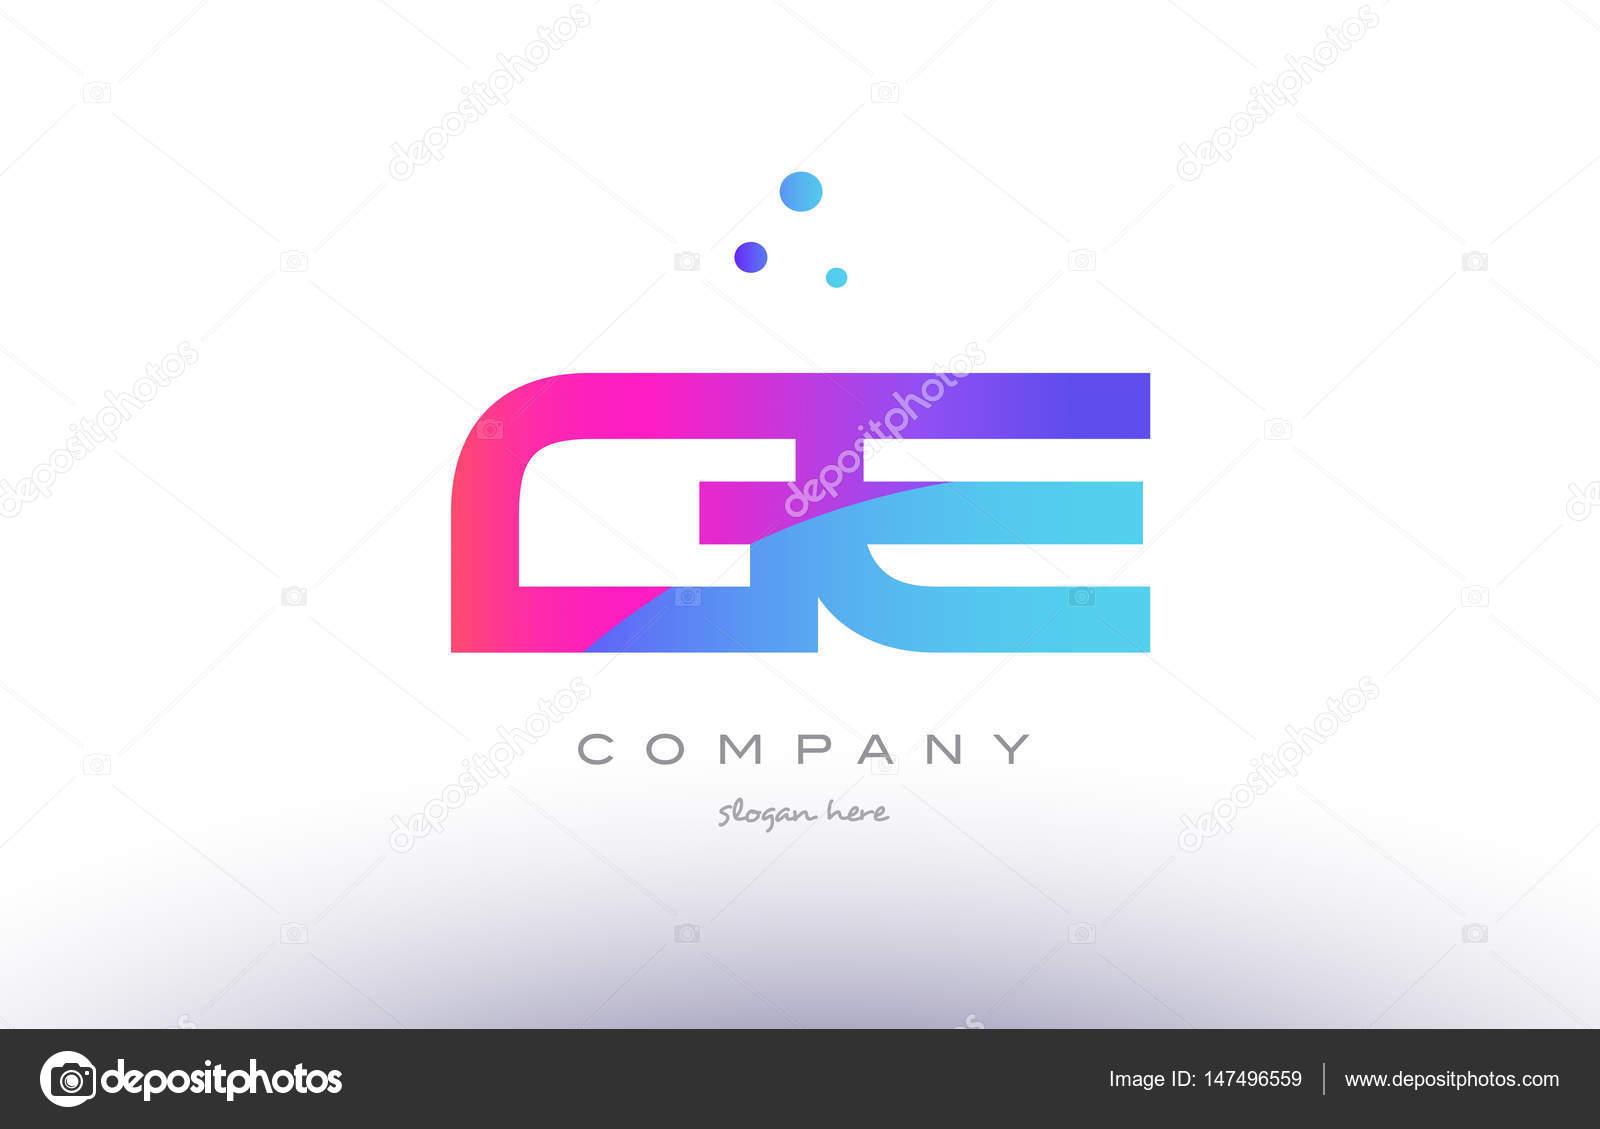 Ge G E Creative Pink Purple Blue Modern Dots Alphabet Gradient Company Letter Logo Design Vector Icon Template By Dragomirescu